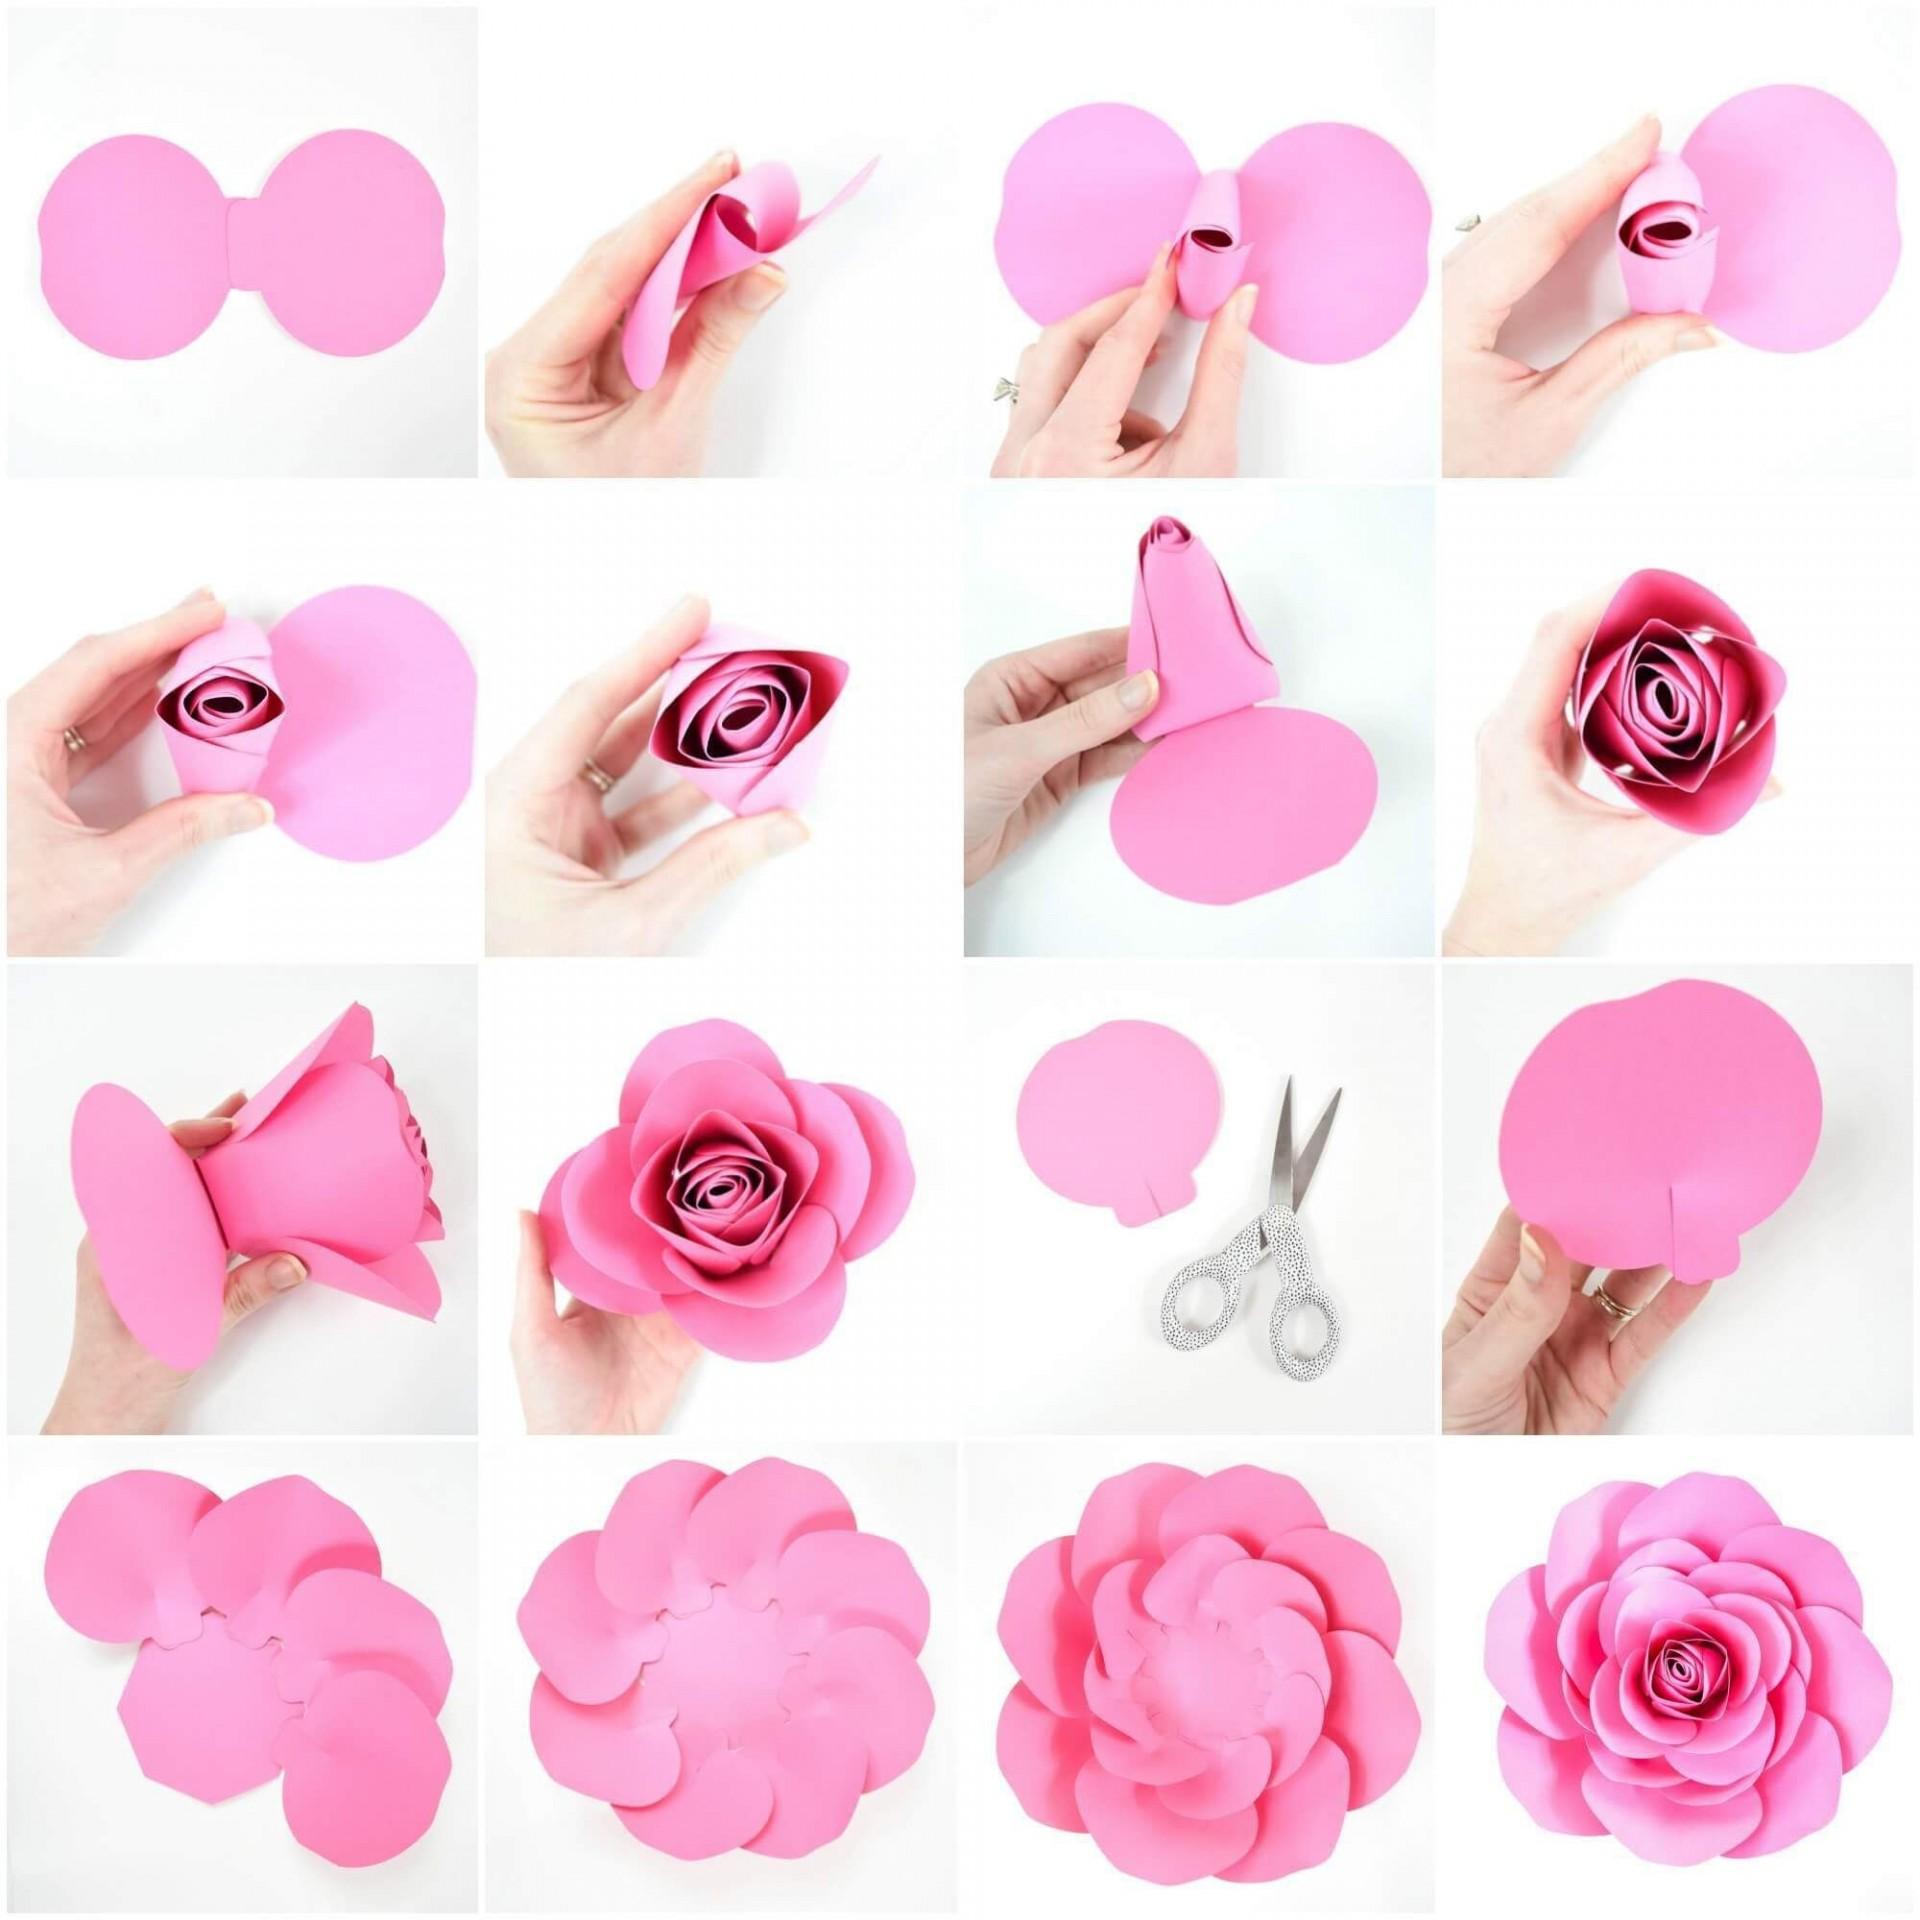 001 Stupendou Free Printable Diy Paper Flower Template Image  Templates1920